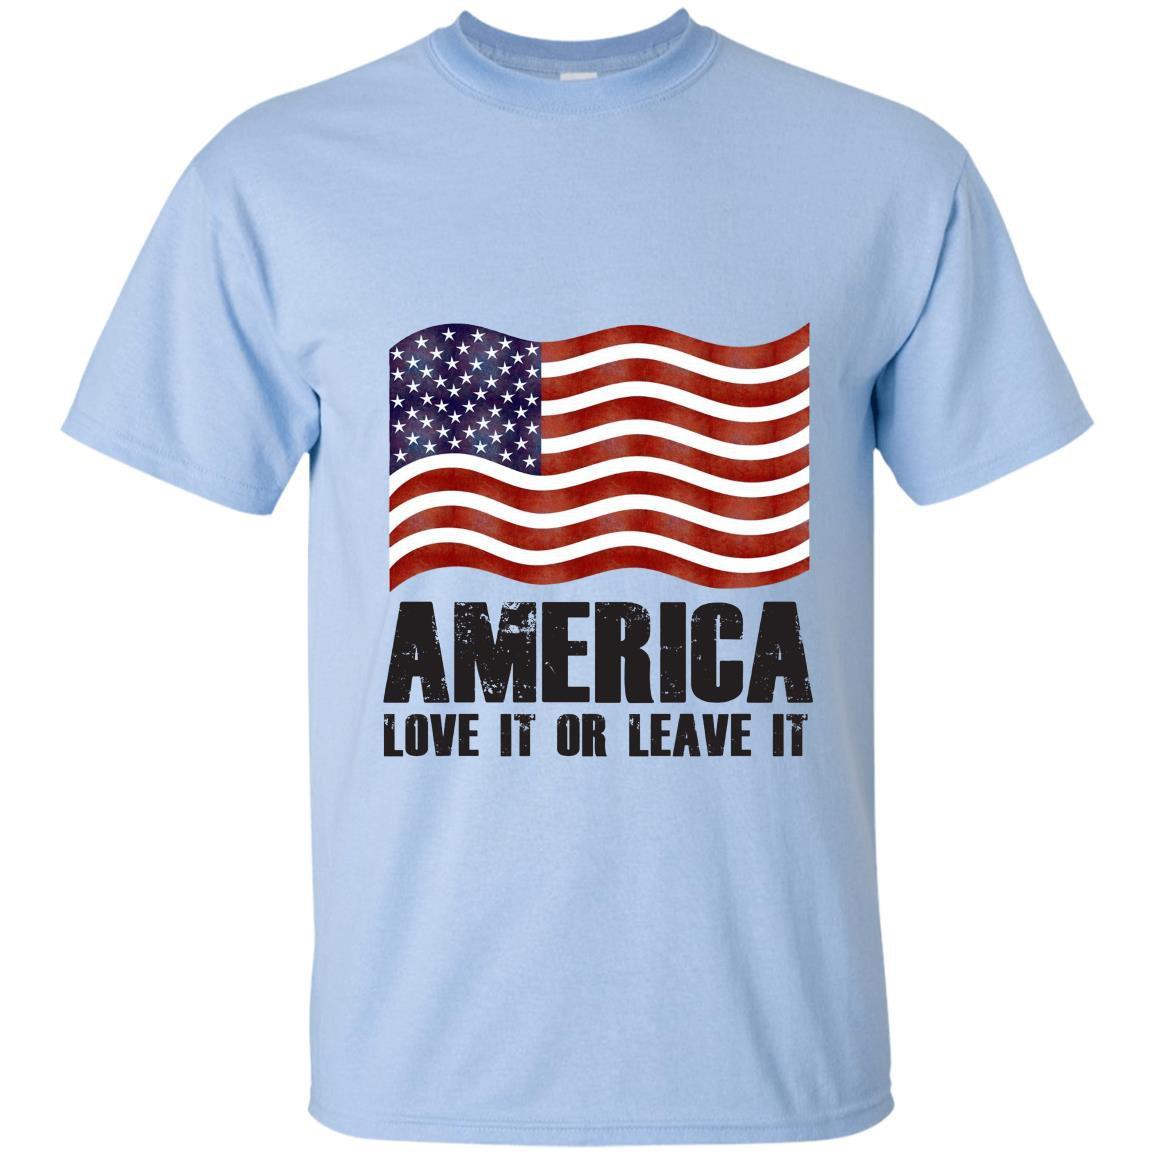 America love it or leave it patriotic american flag T-shirt